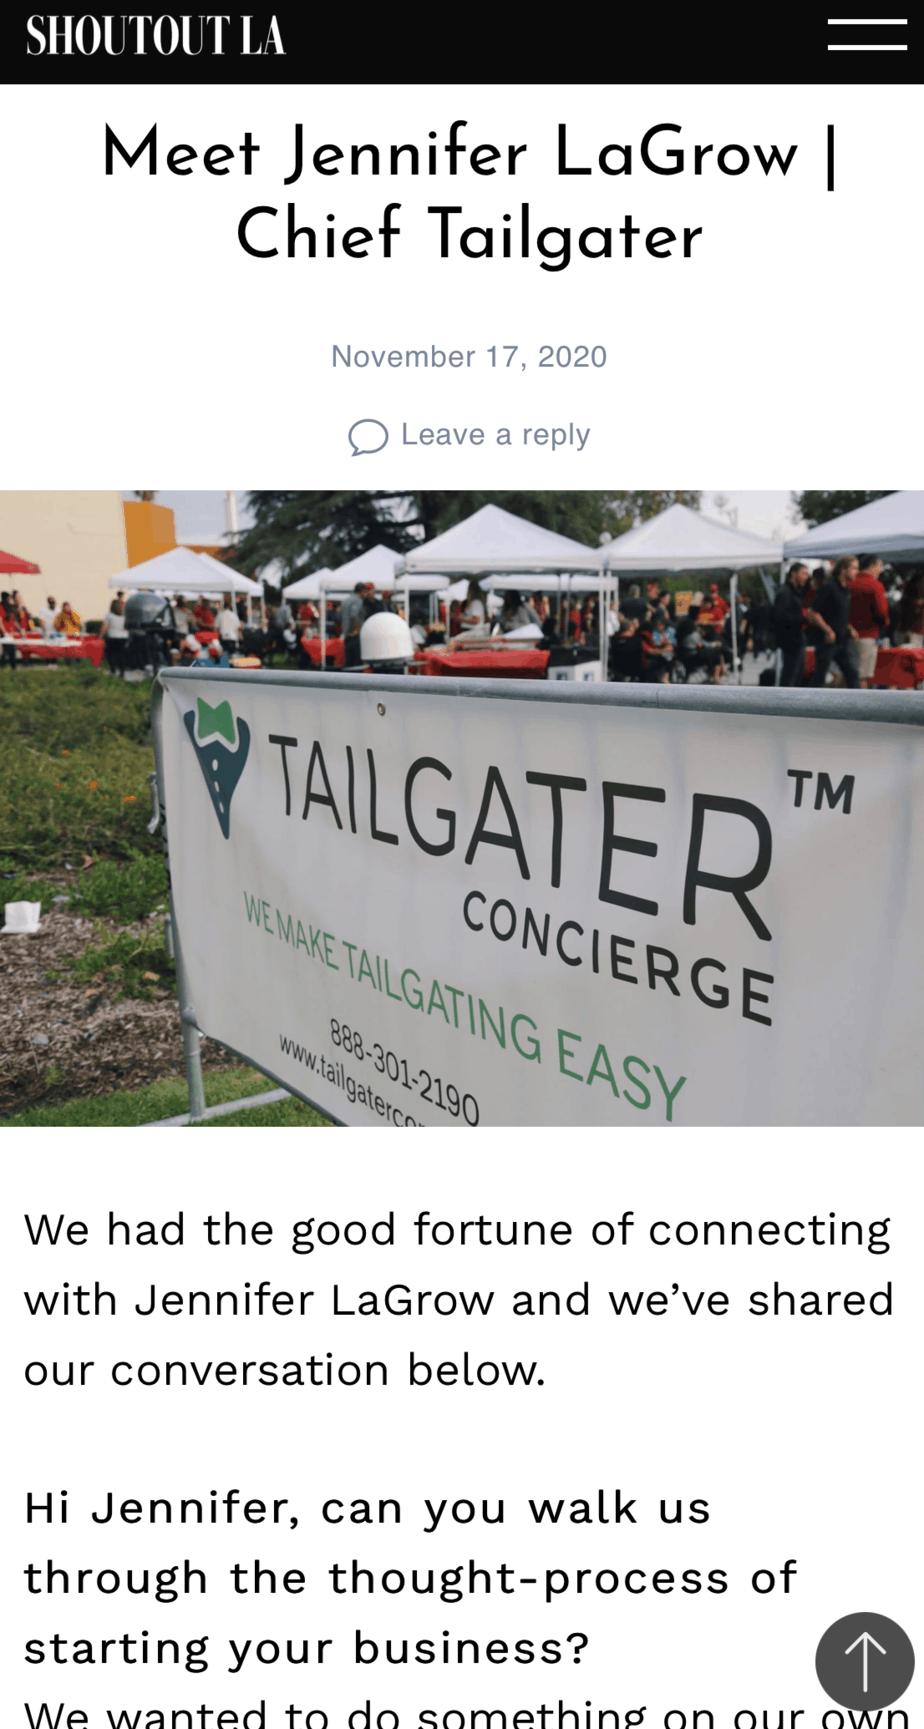 Tailgater Concierge Tailgate Service